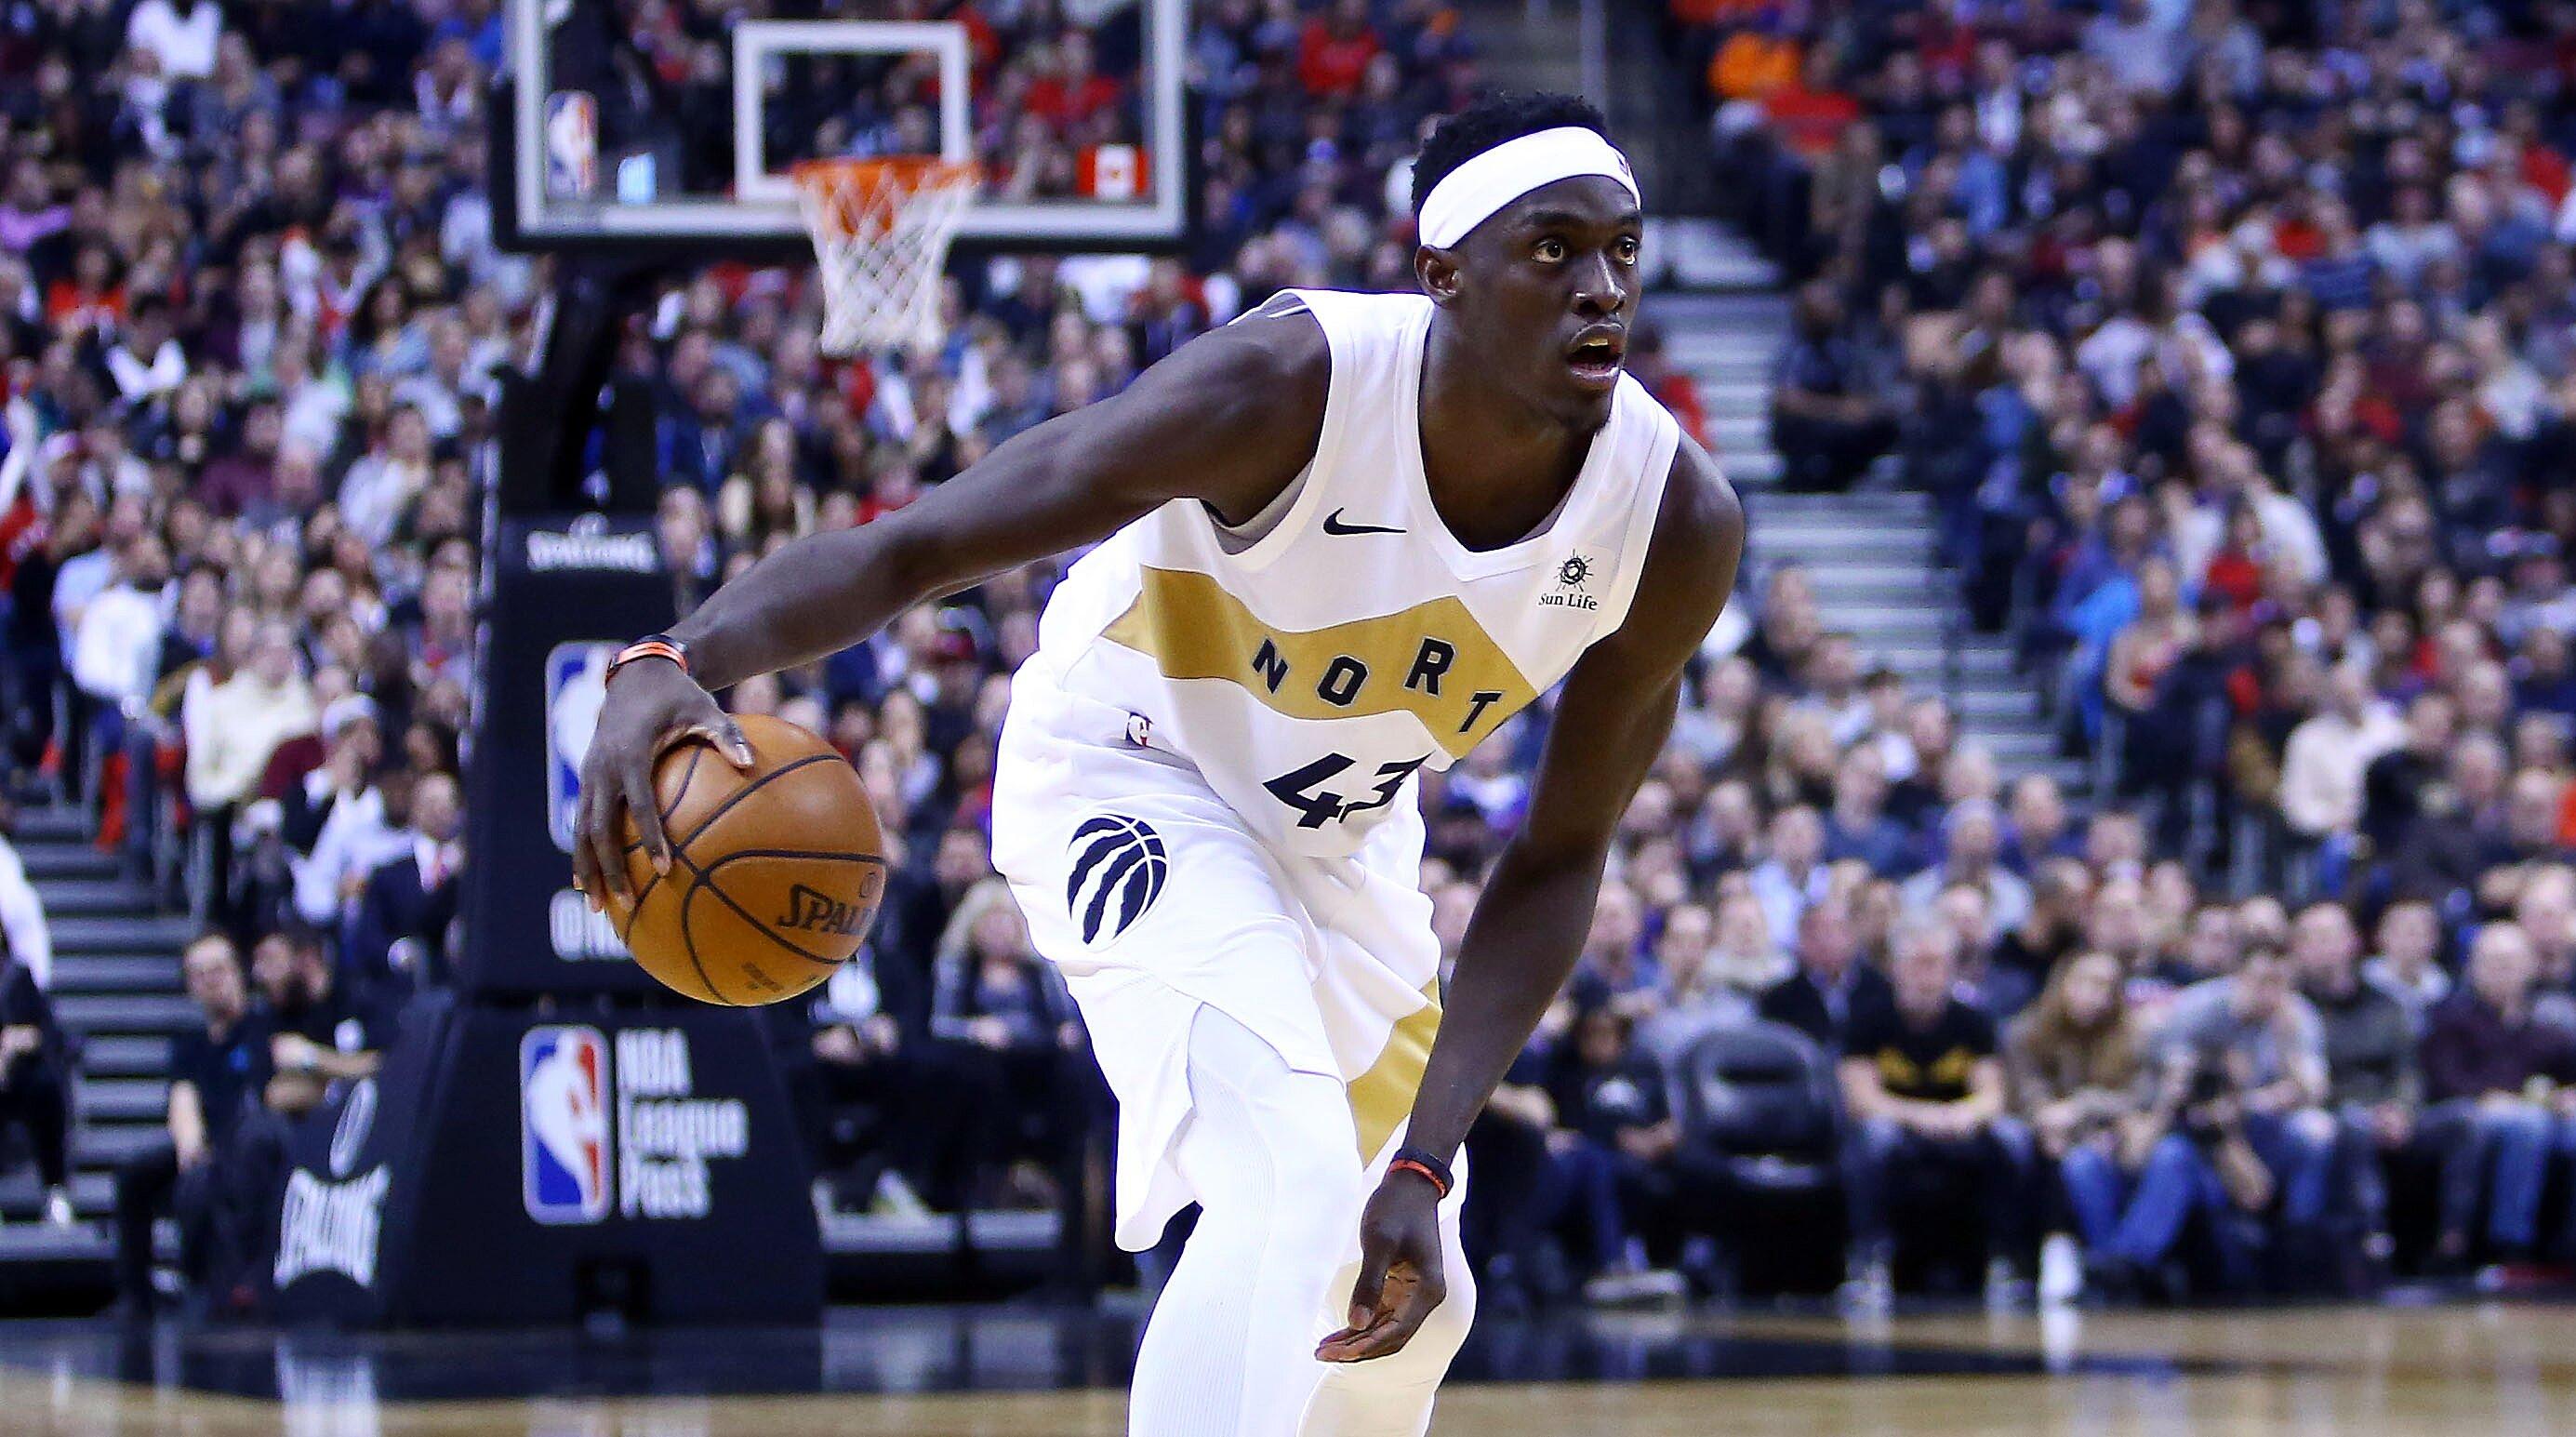 9a9fc5272c35 2019 NBA Awards  Giannis Antetokounmpo and the Bucks dominate